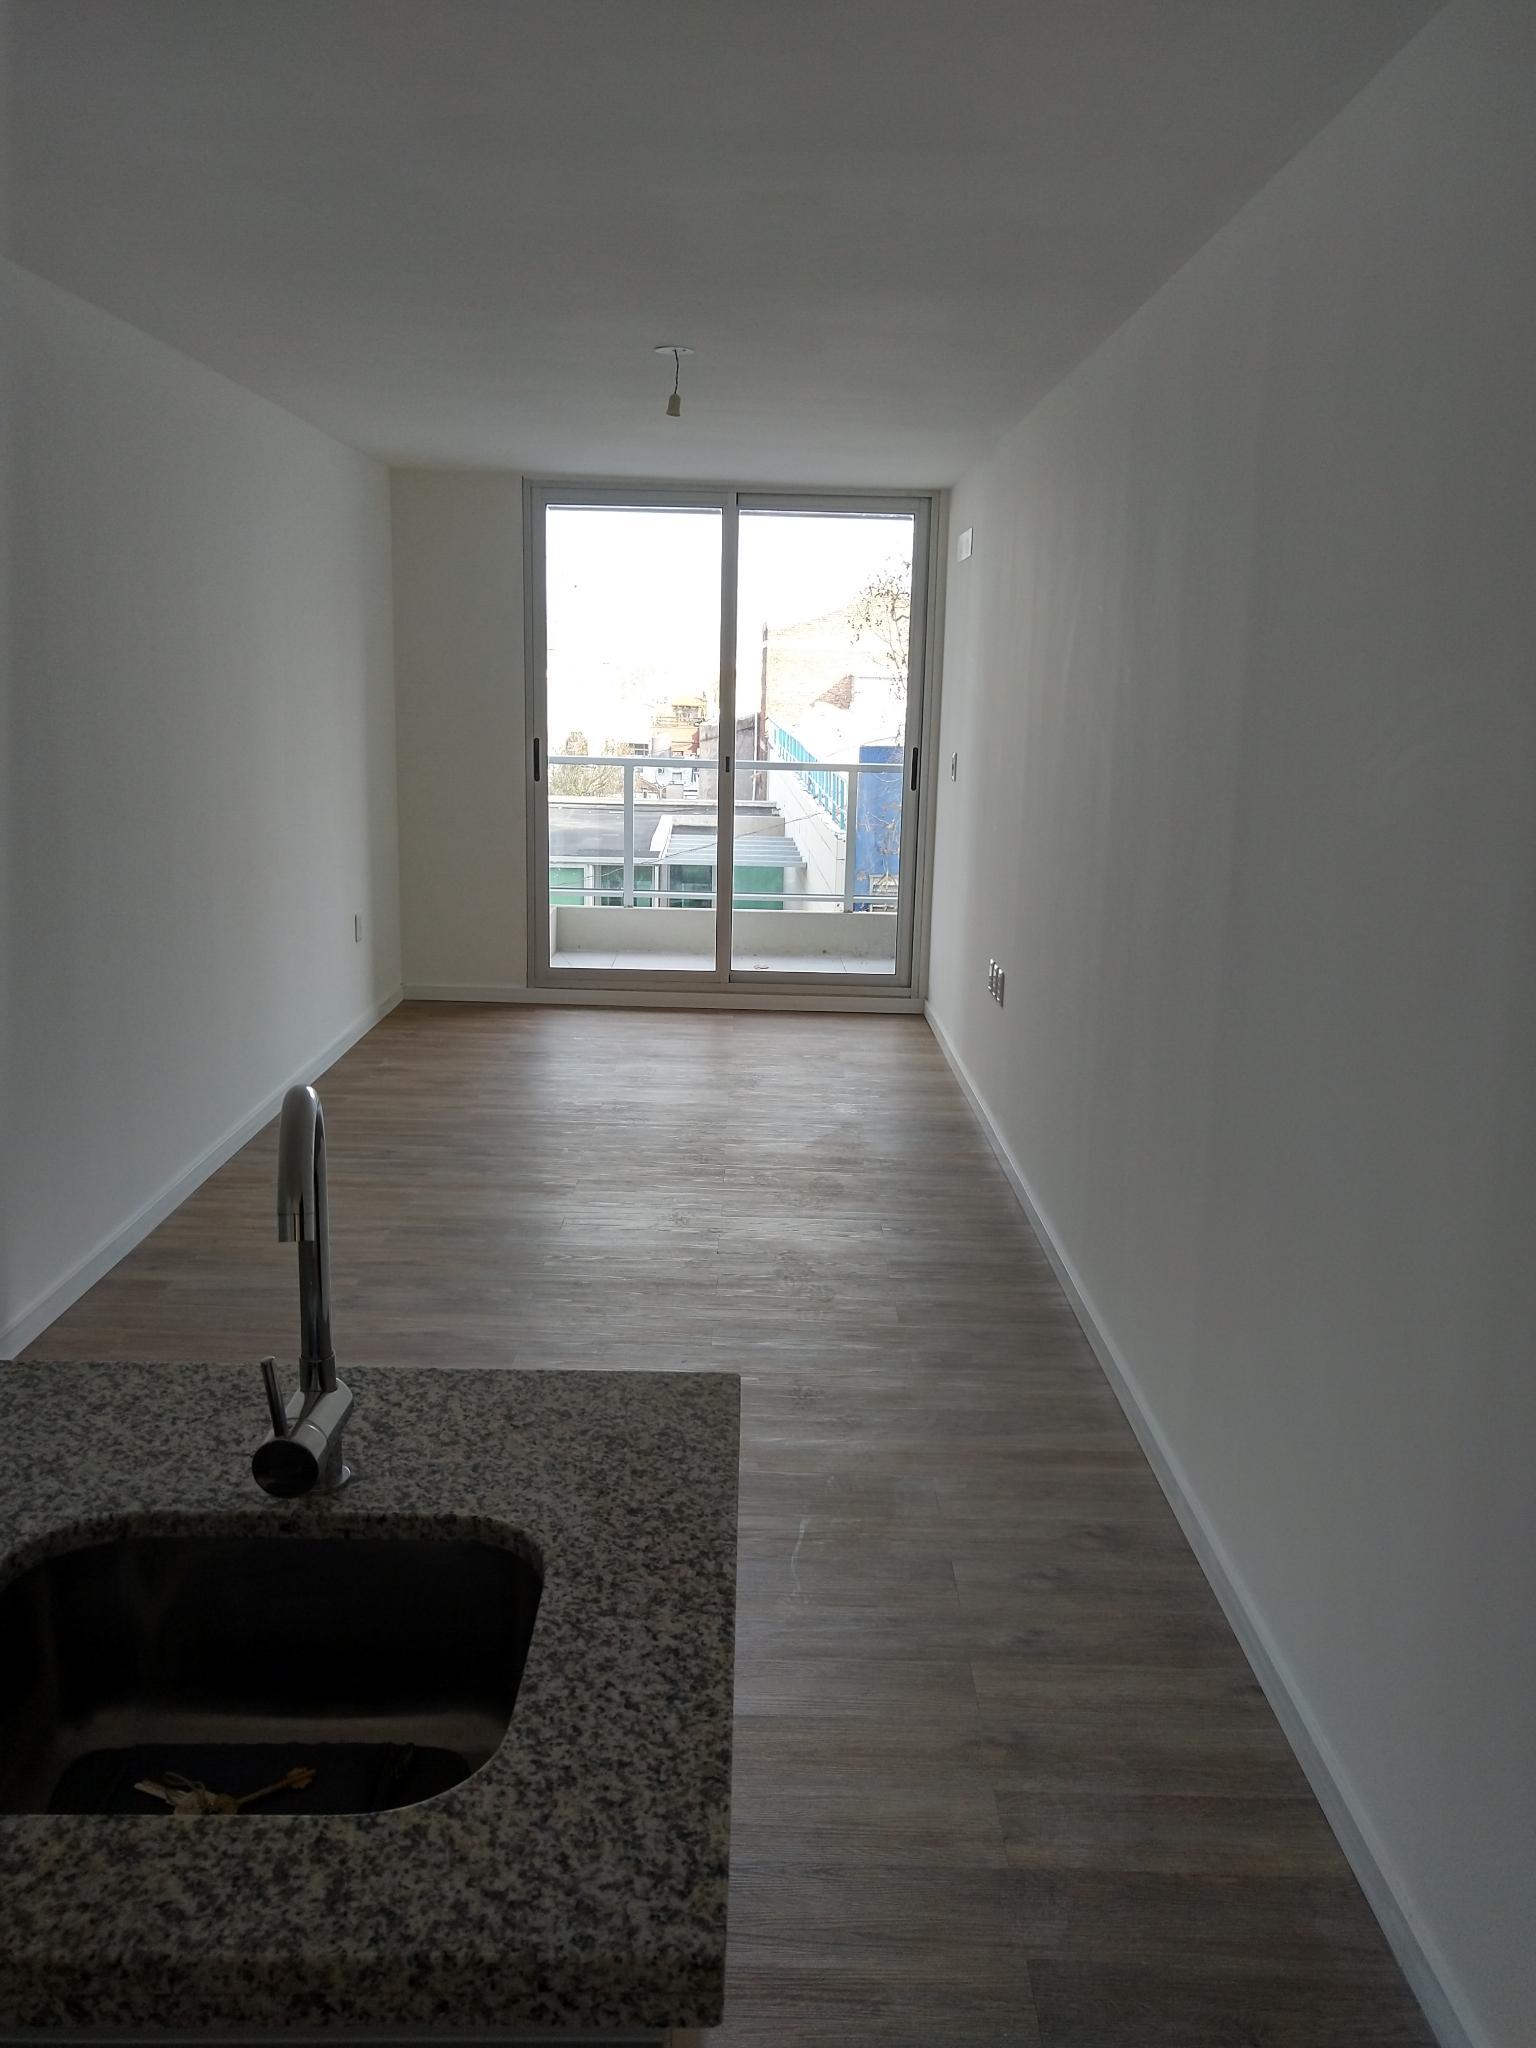 Alquiler - 1 Dormitorio - Nuevo - Lift Cordon